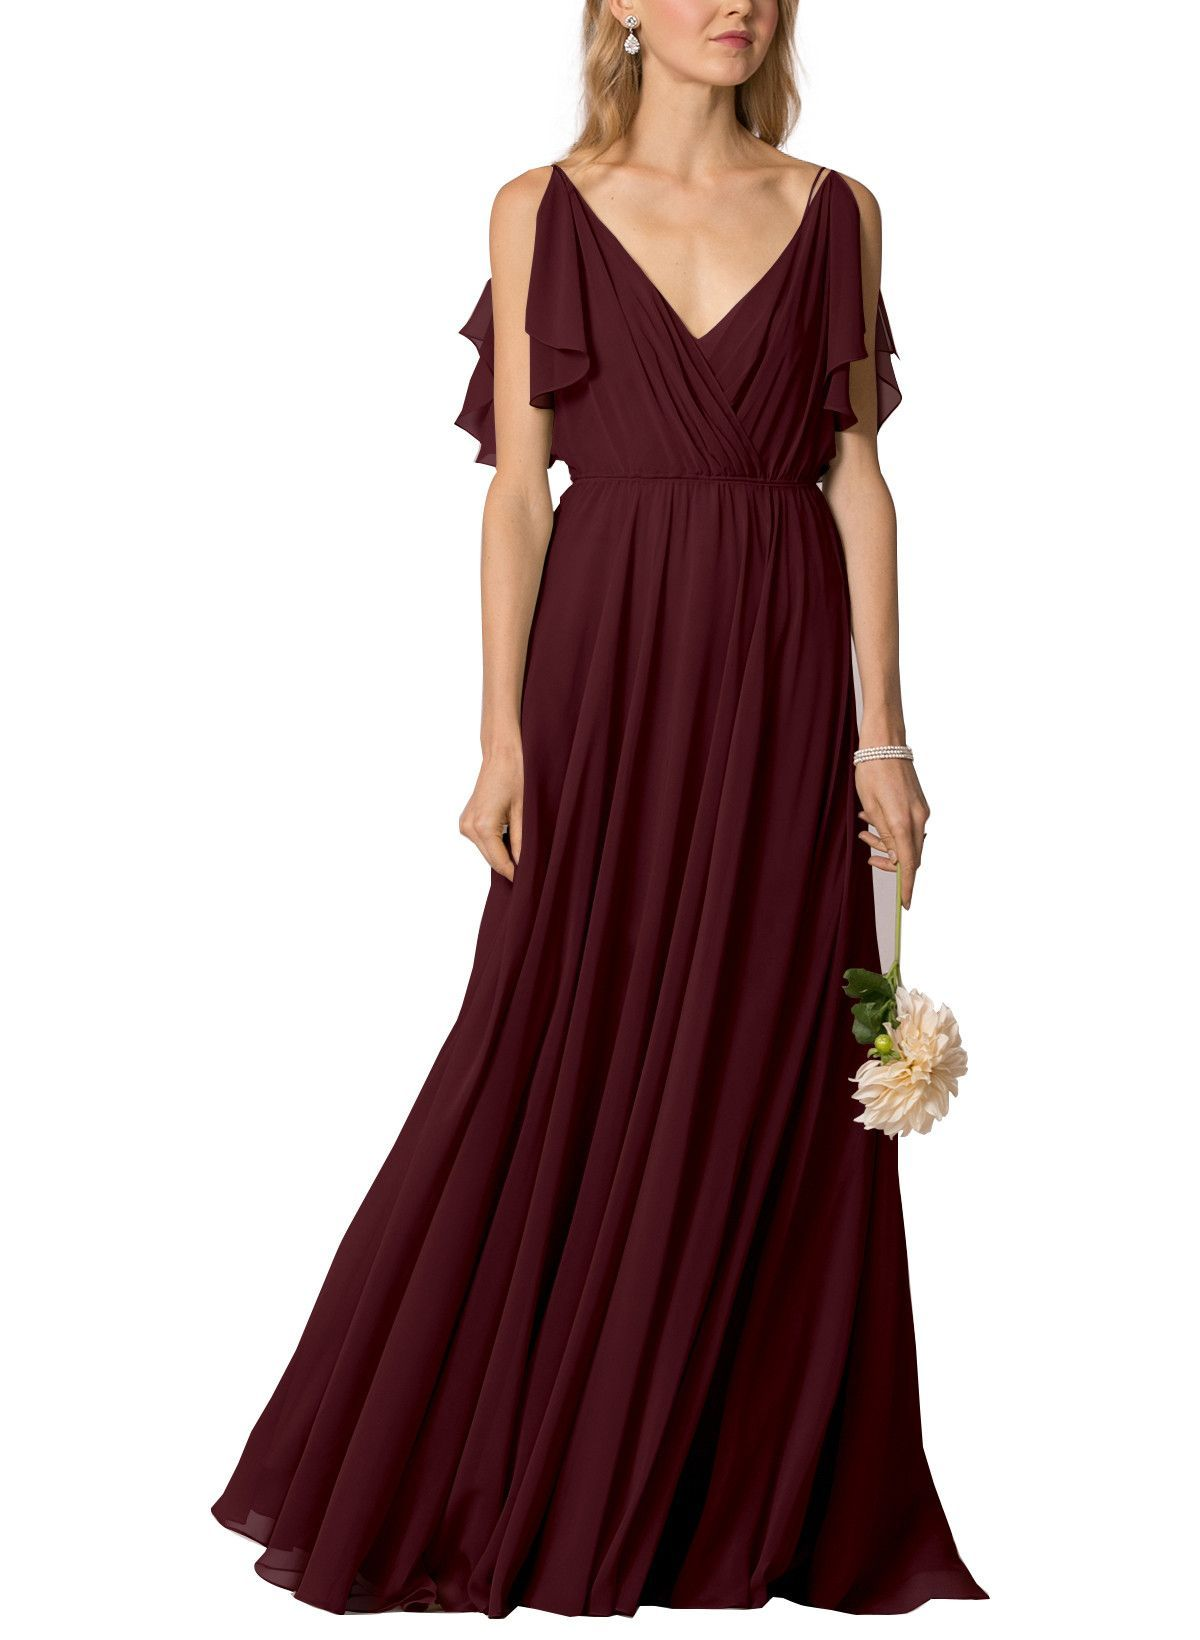 7d7168749af Jenny Yoo Cassie Bridesmaid Dress